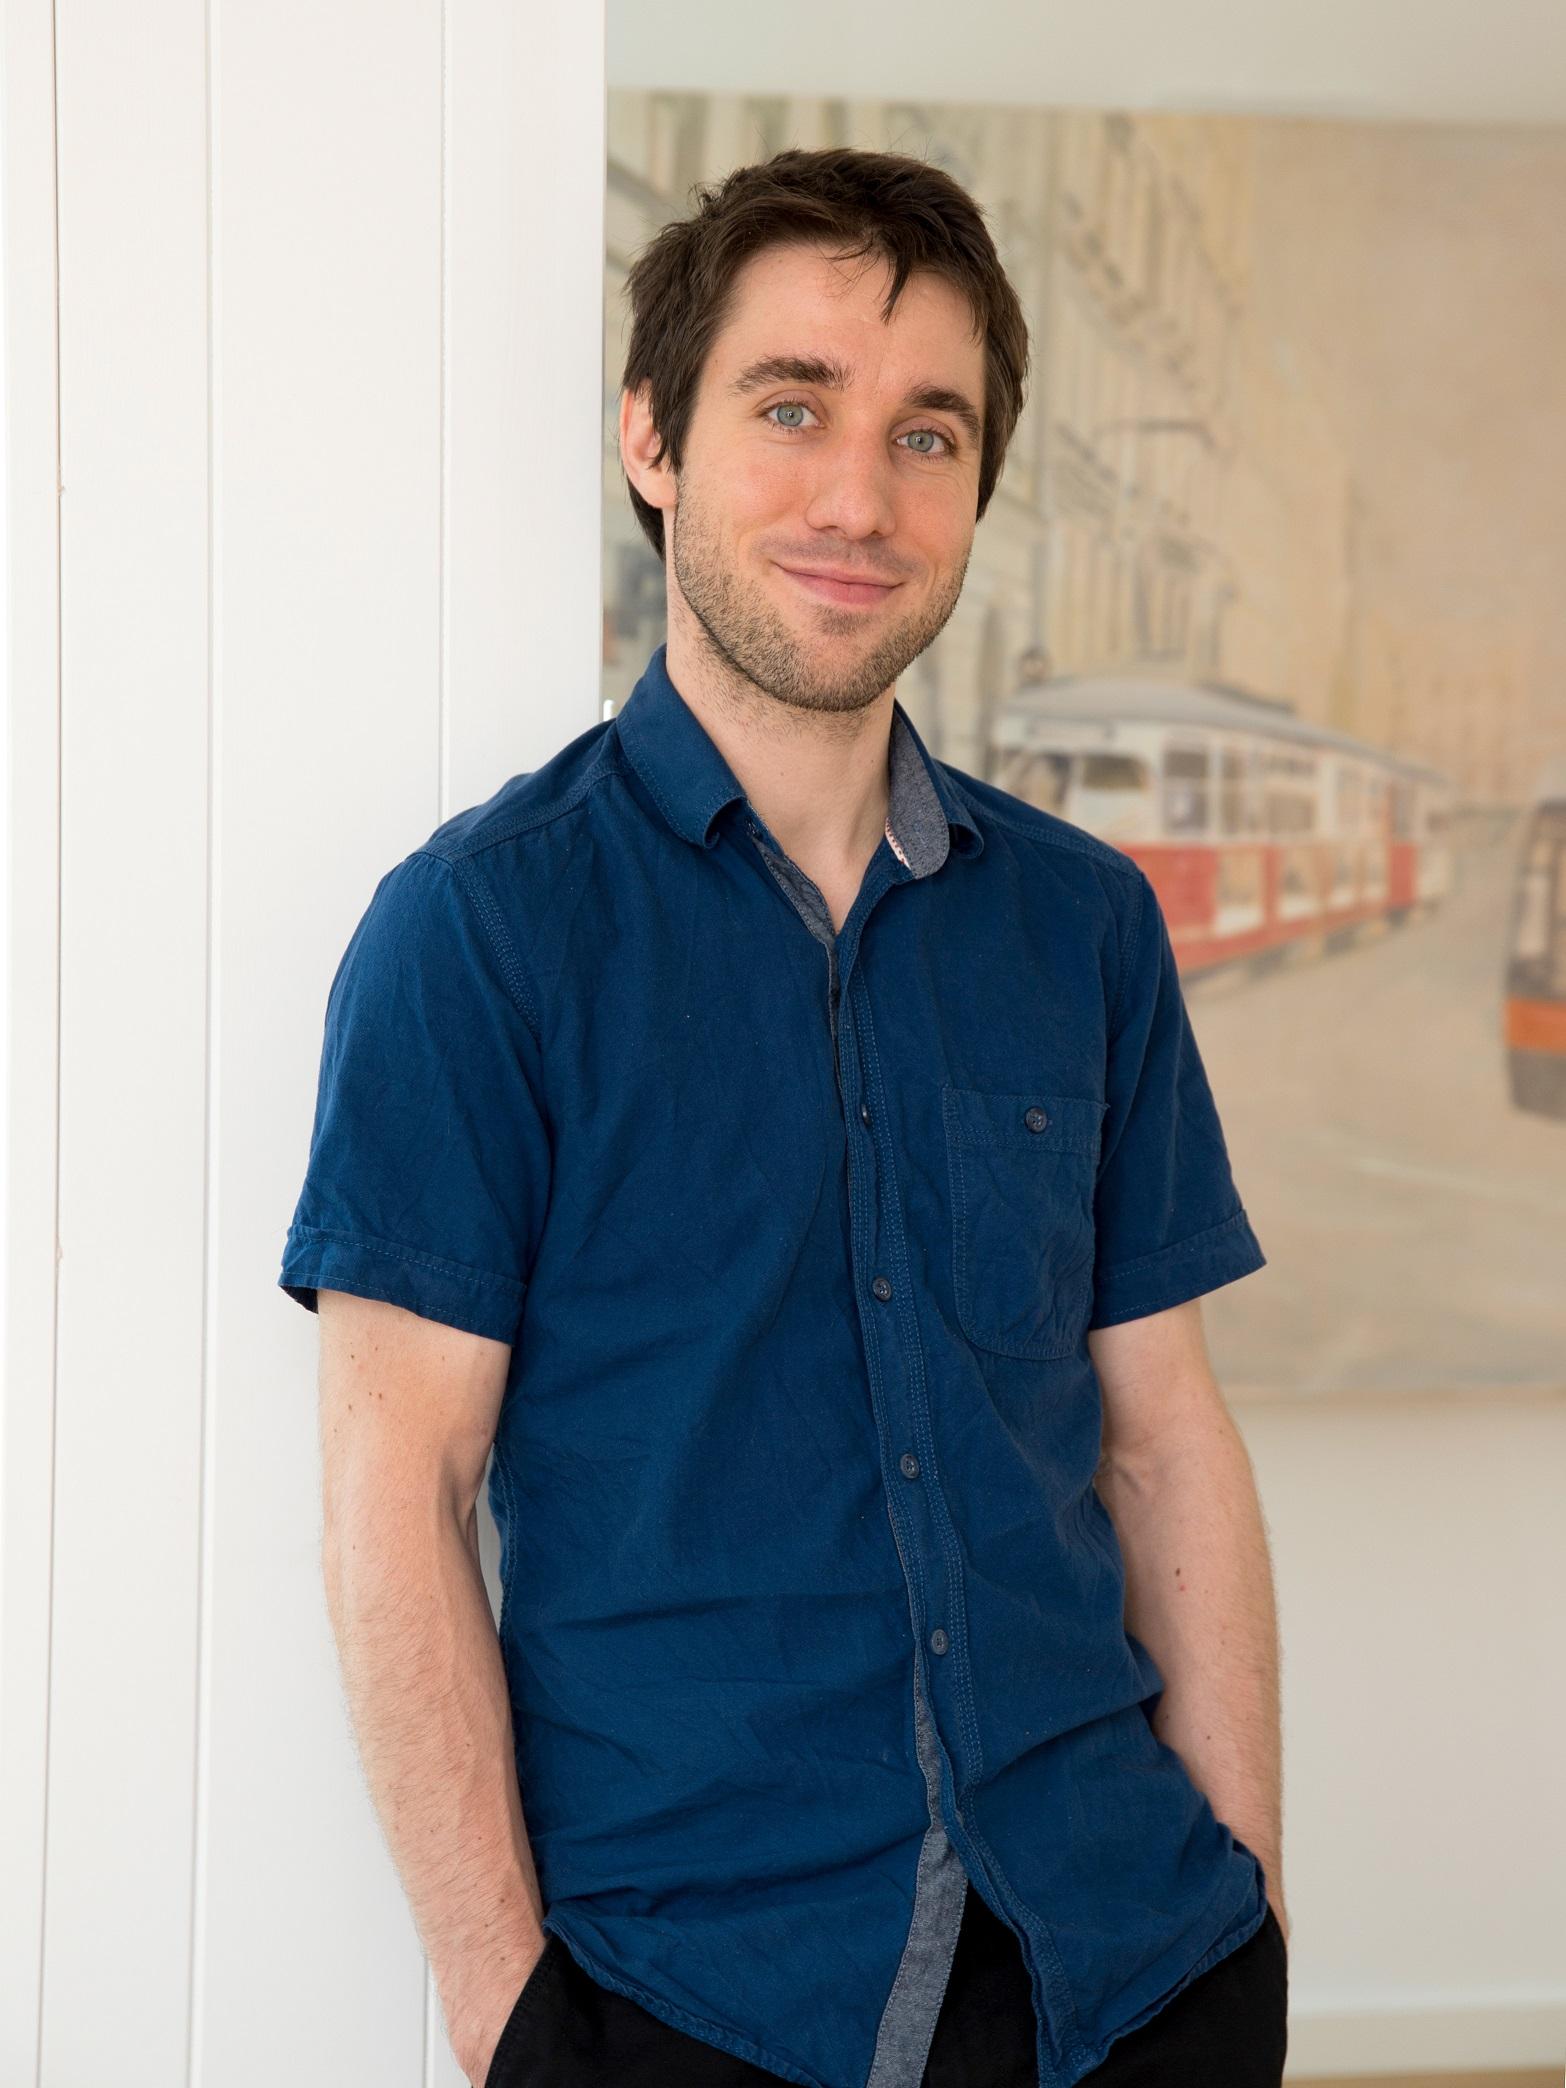 Michael Trink